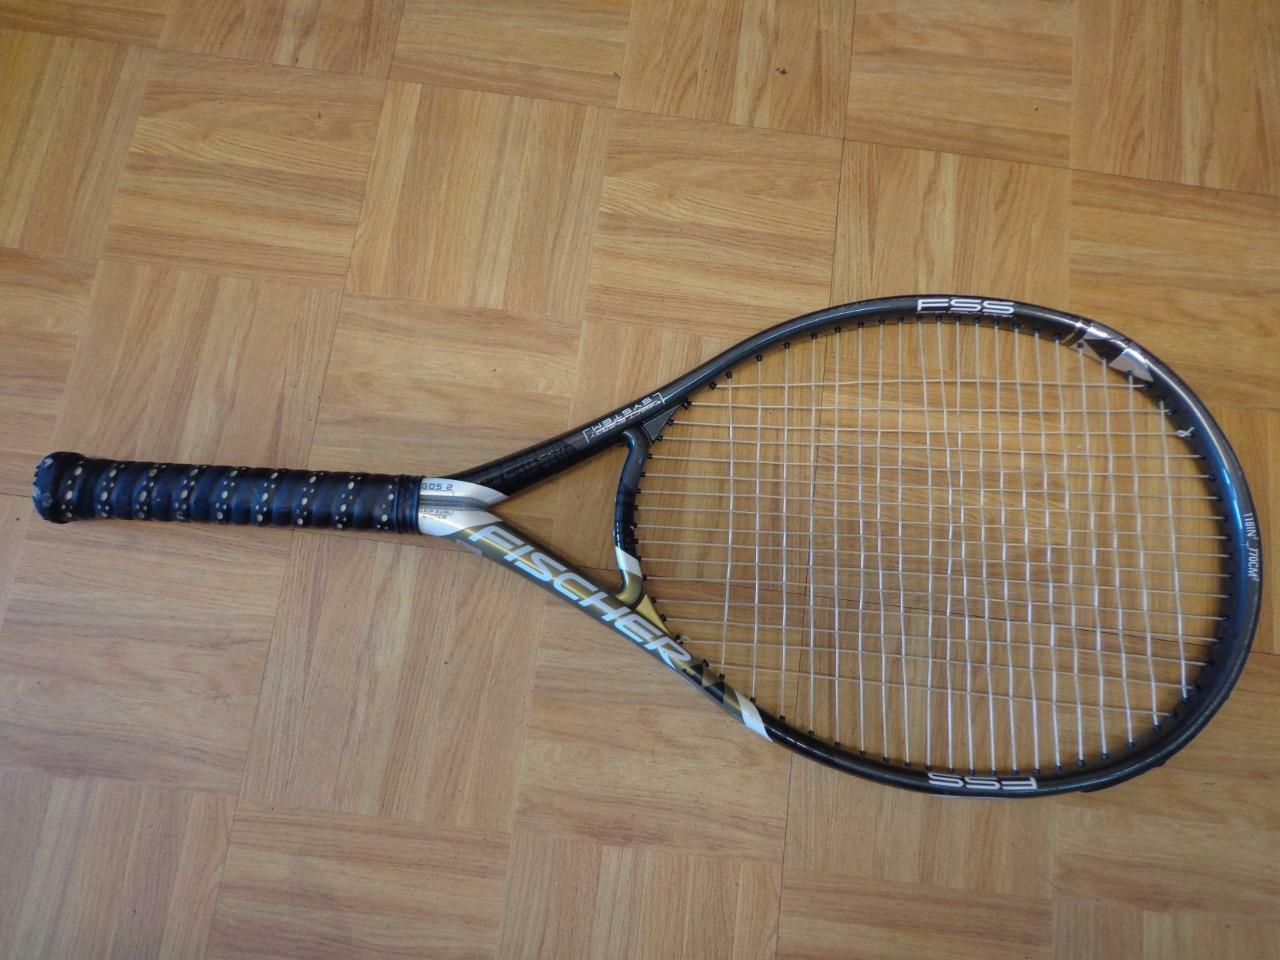 Fischer doble Tech carbono 1250 118 cabeza 4 1 8 Grip Tenis Raqueta